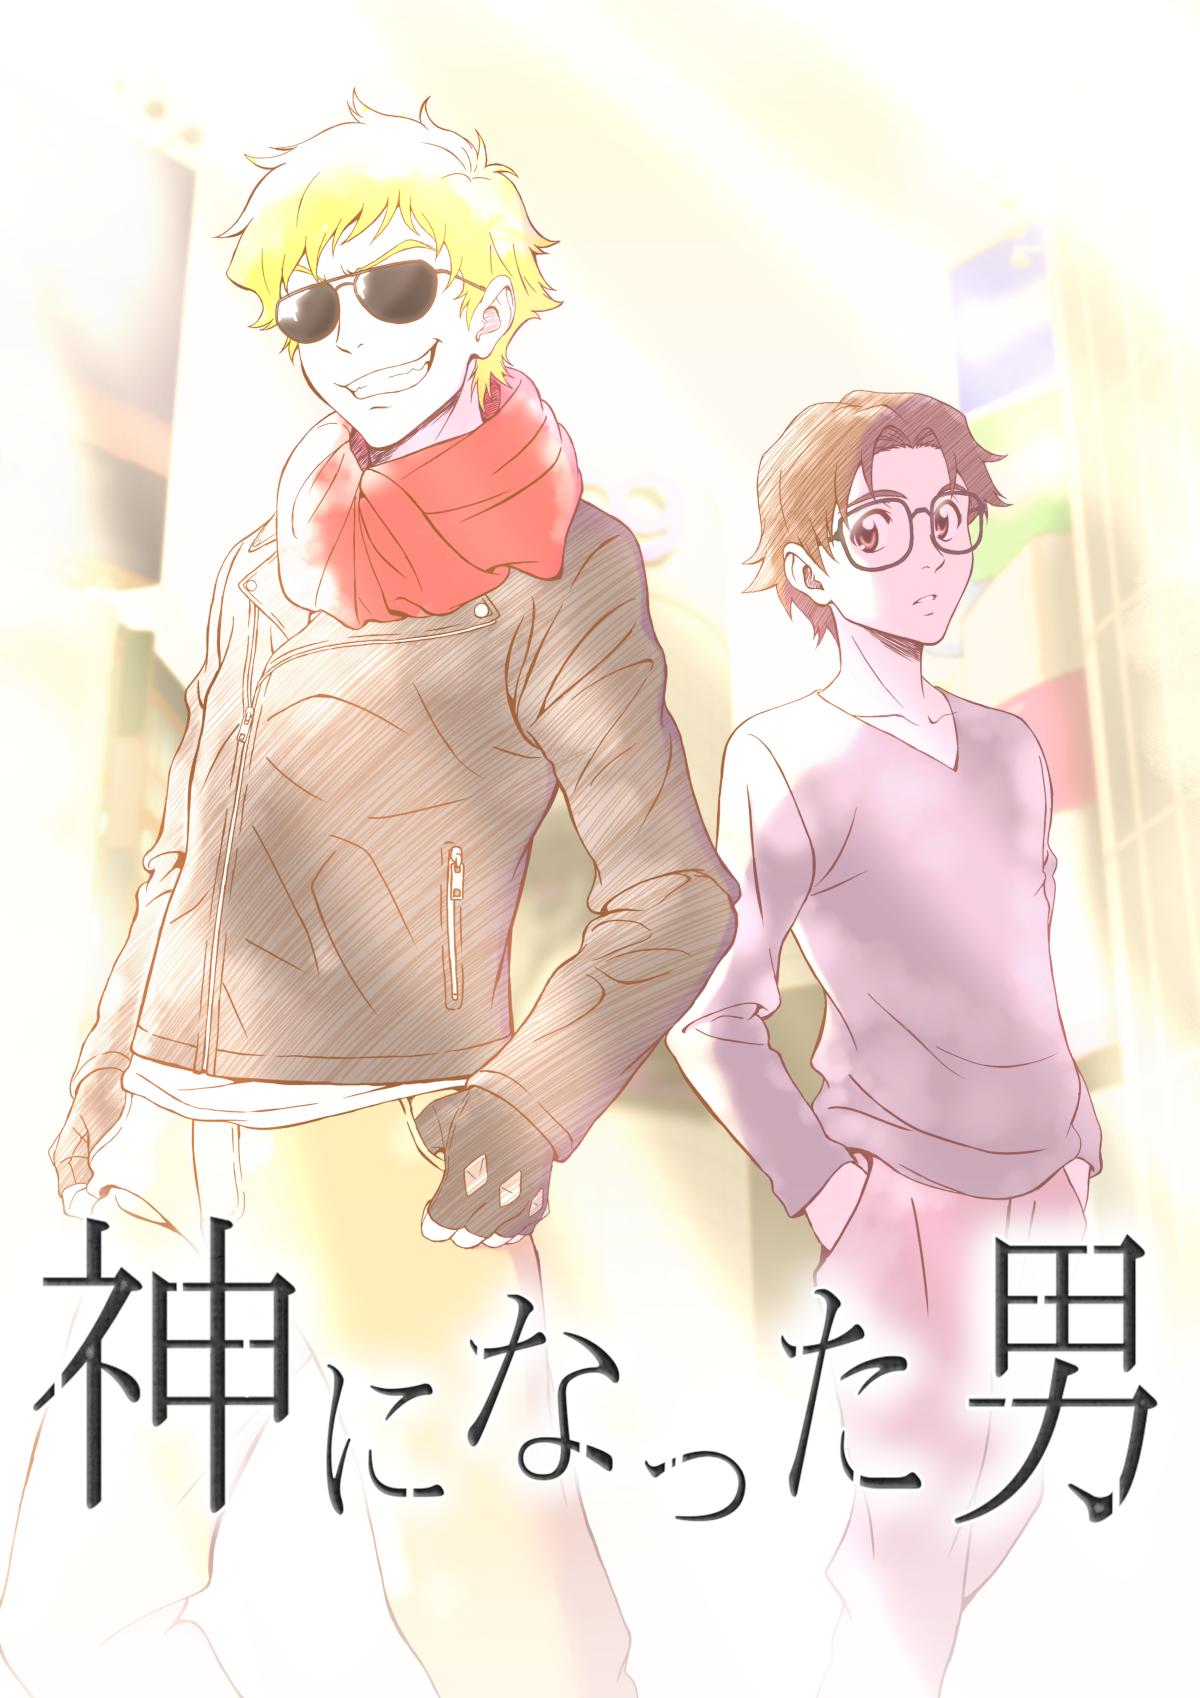 WIT STUDIOオリジナル小説「神になった男」WITアプリにて本日連載スタート!